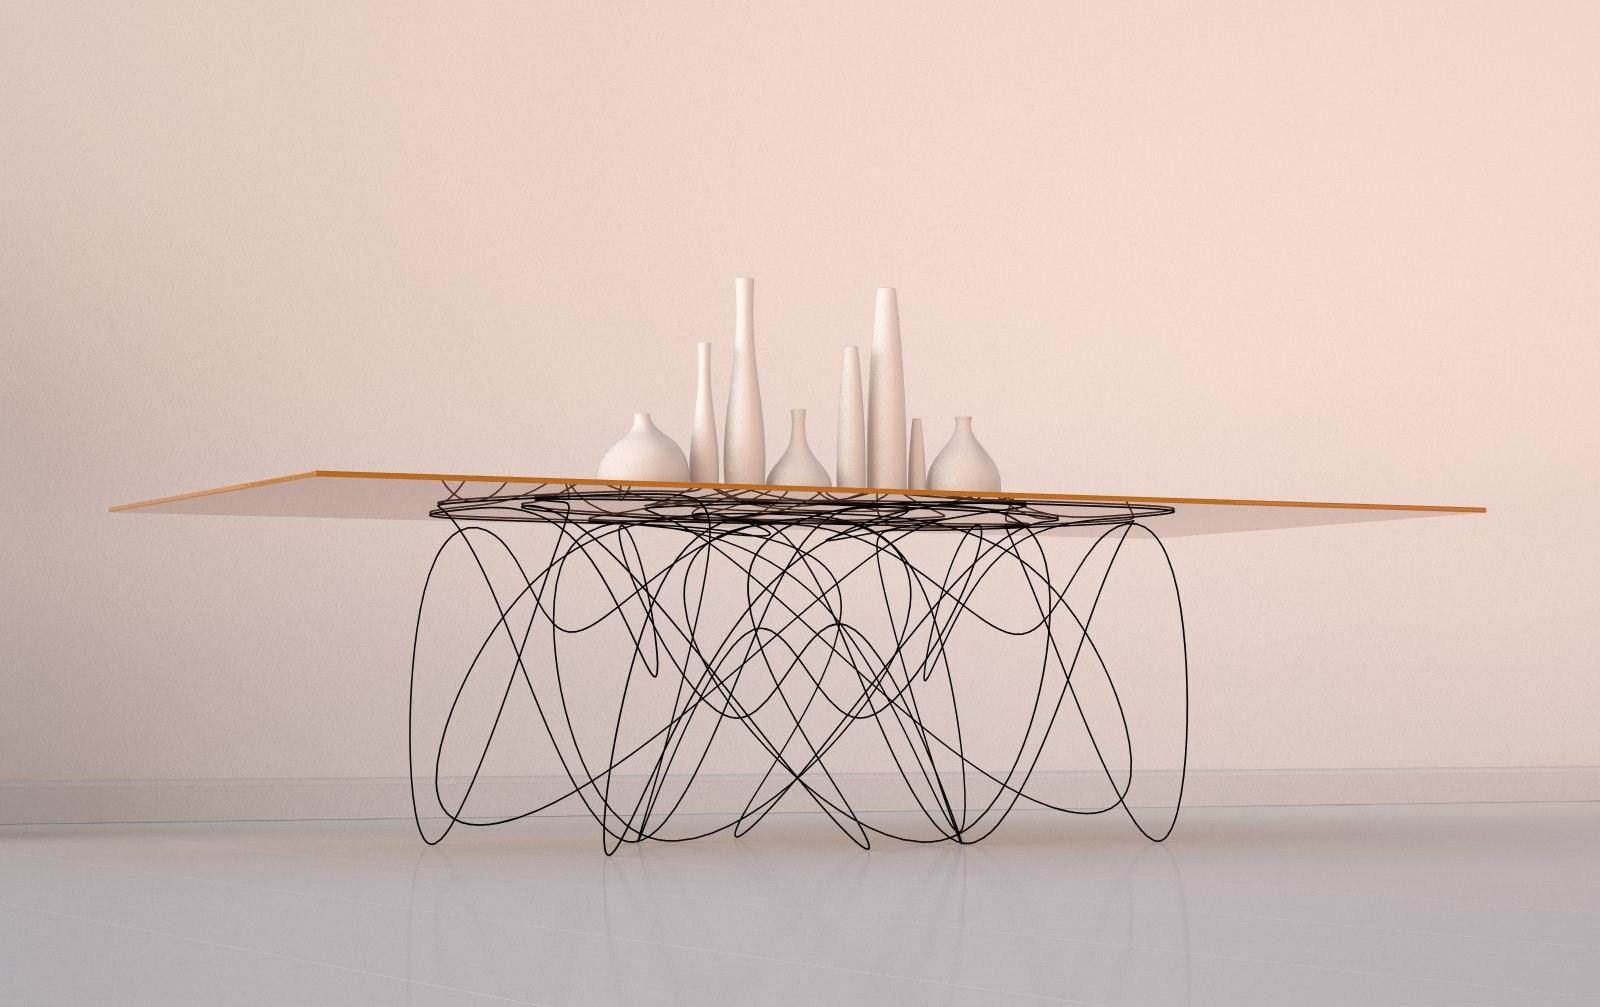 Jason Phillips Design